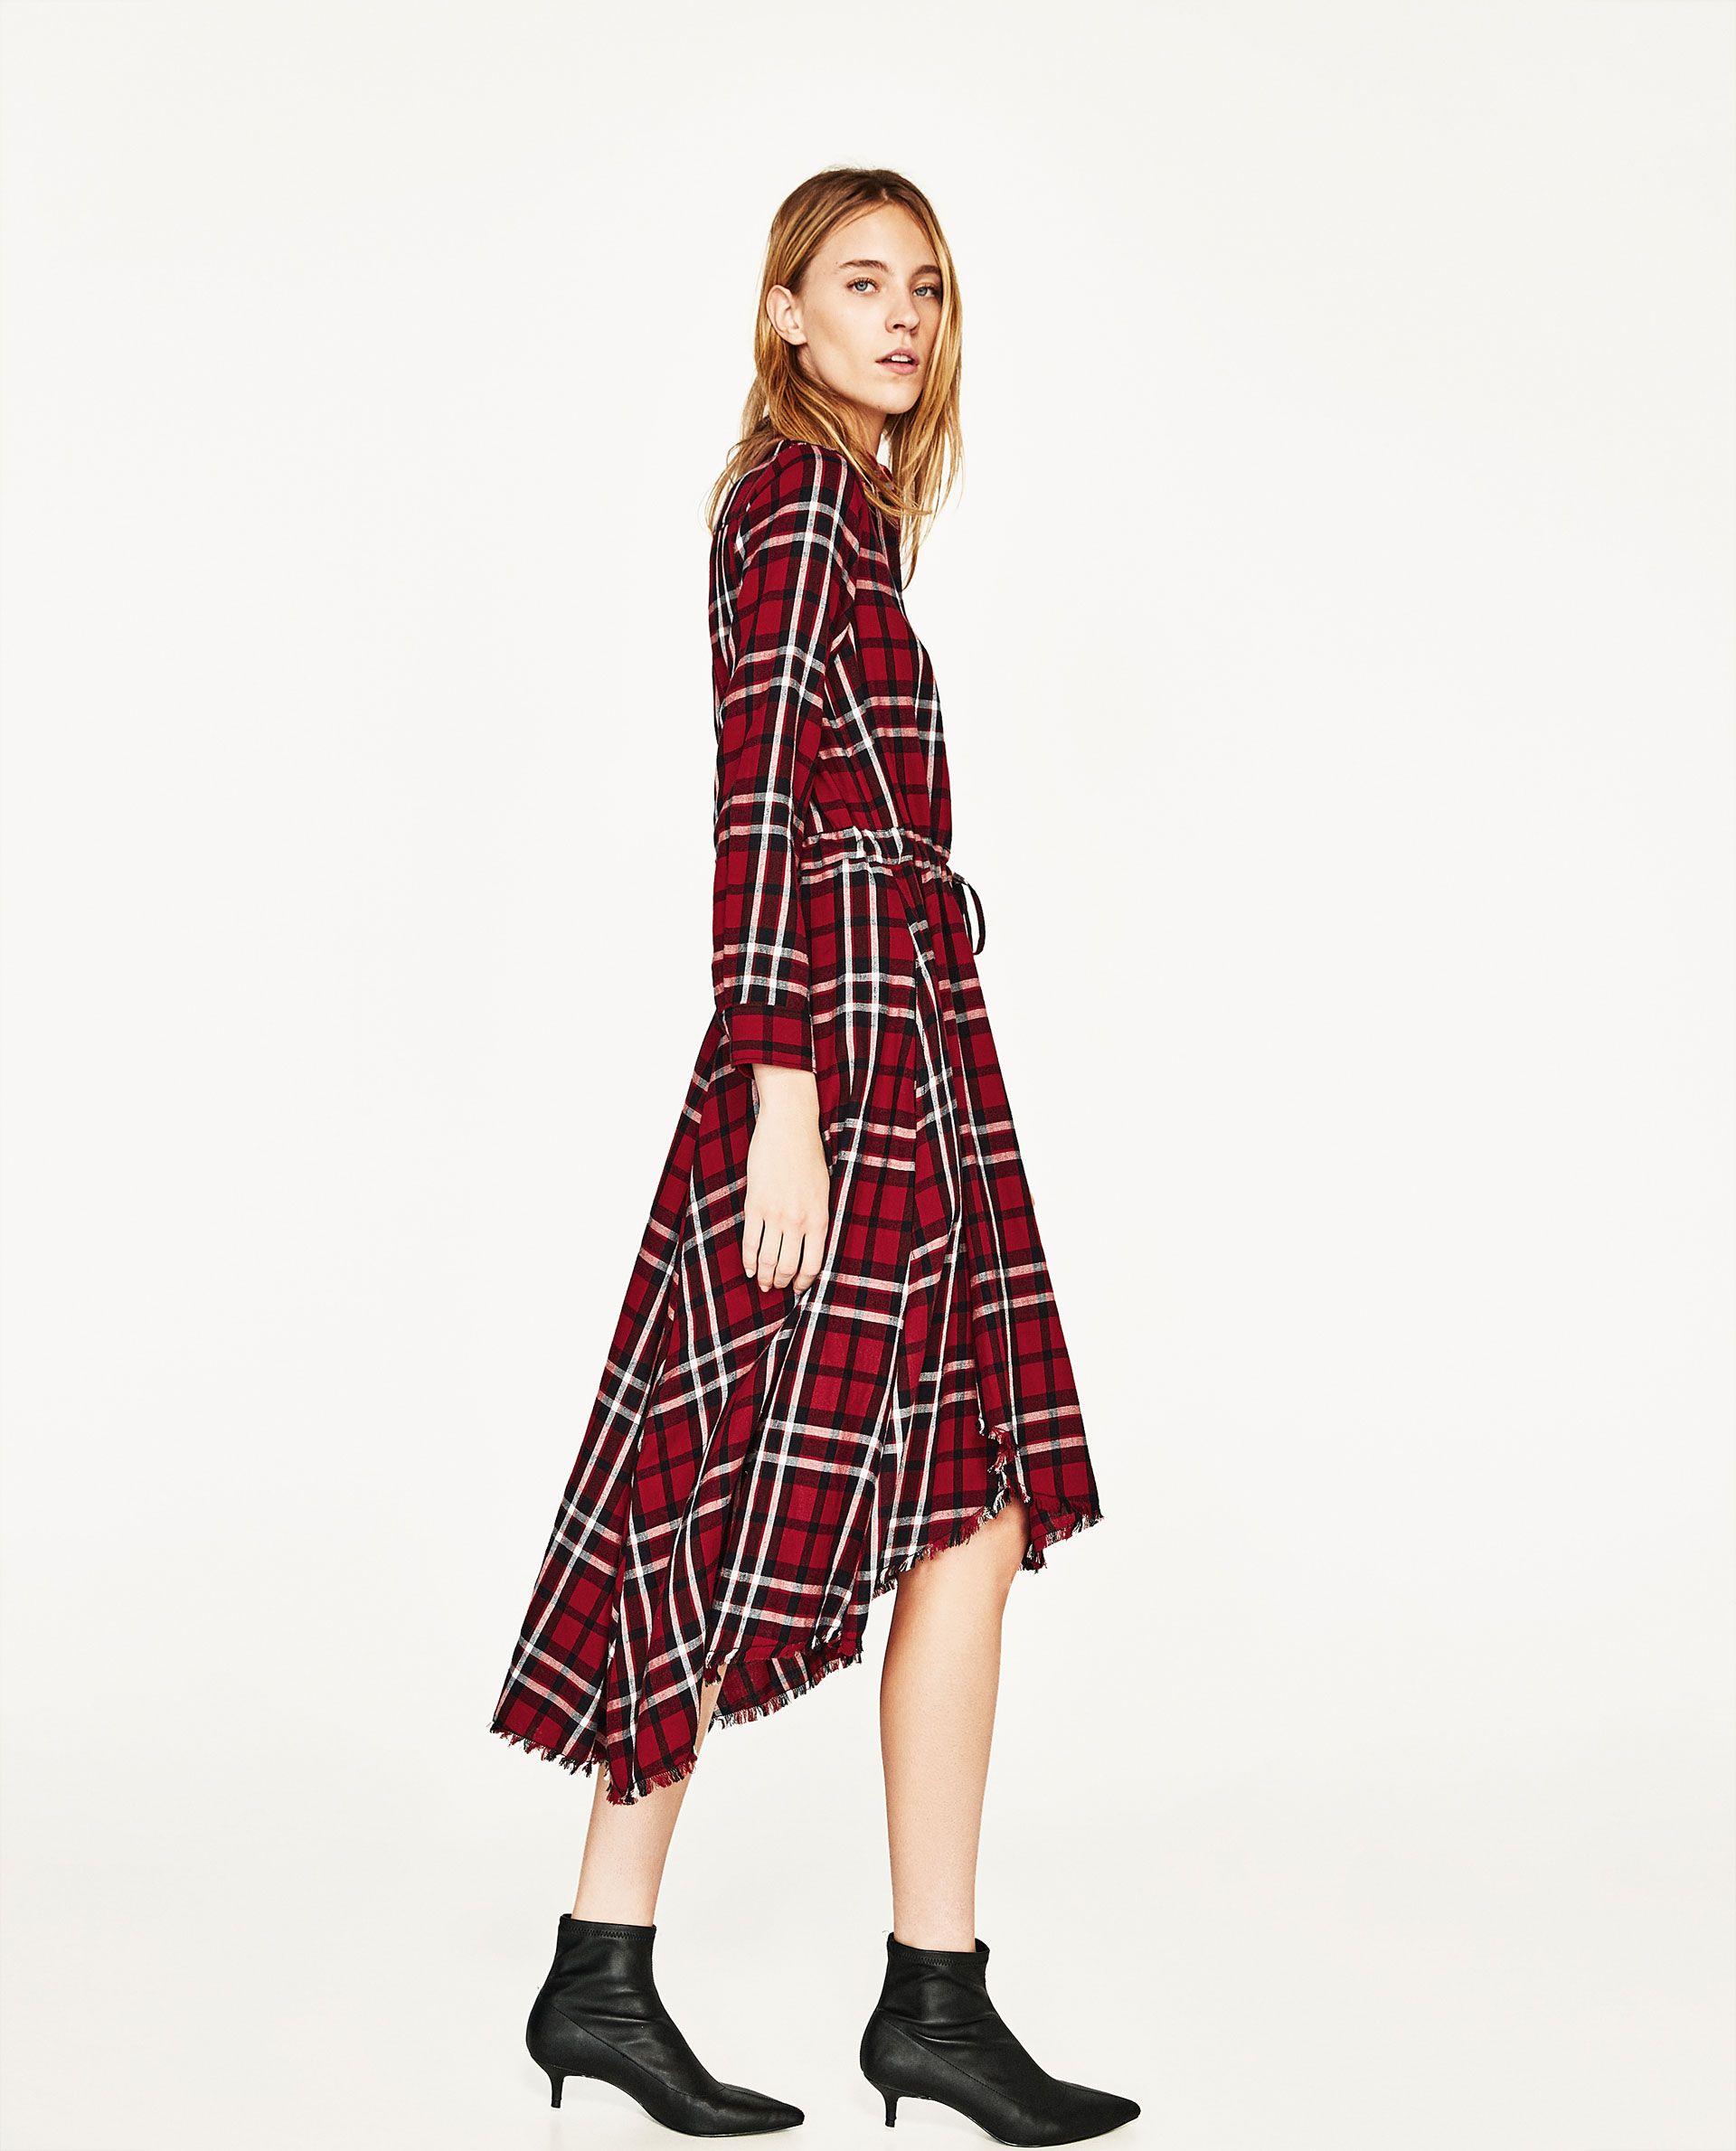 Asymmetric Check Midi Dress Zara Trends Fashion Photoshoot Fashion